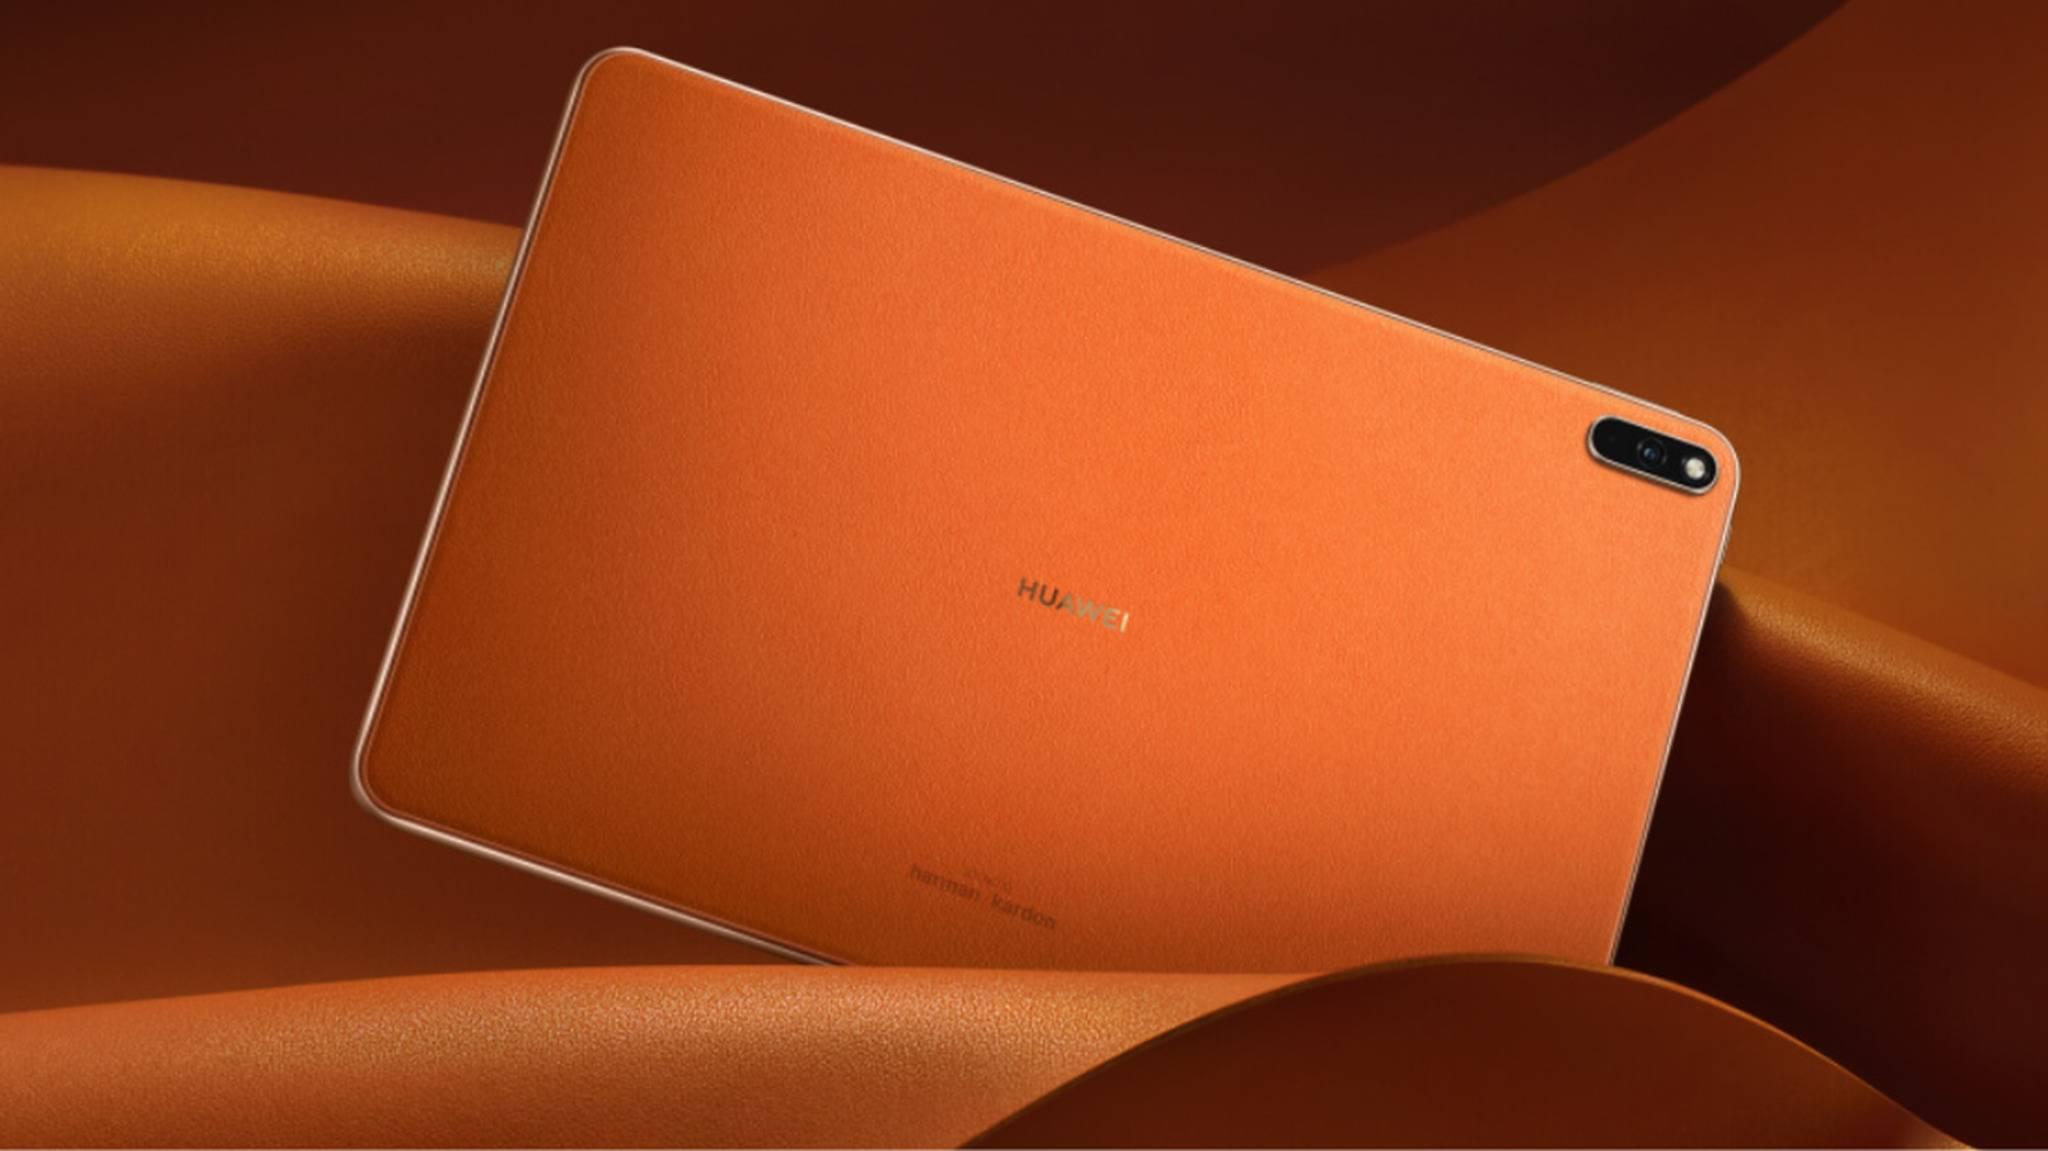 huawei-matepad-pro-color-orange-pc-1